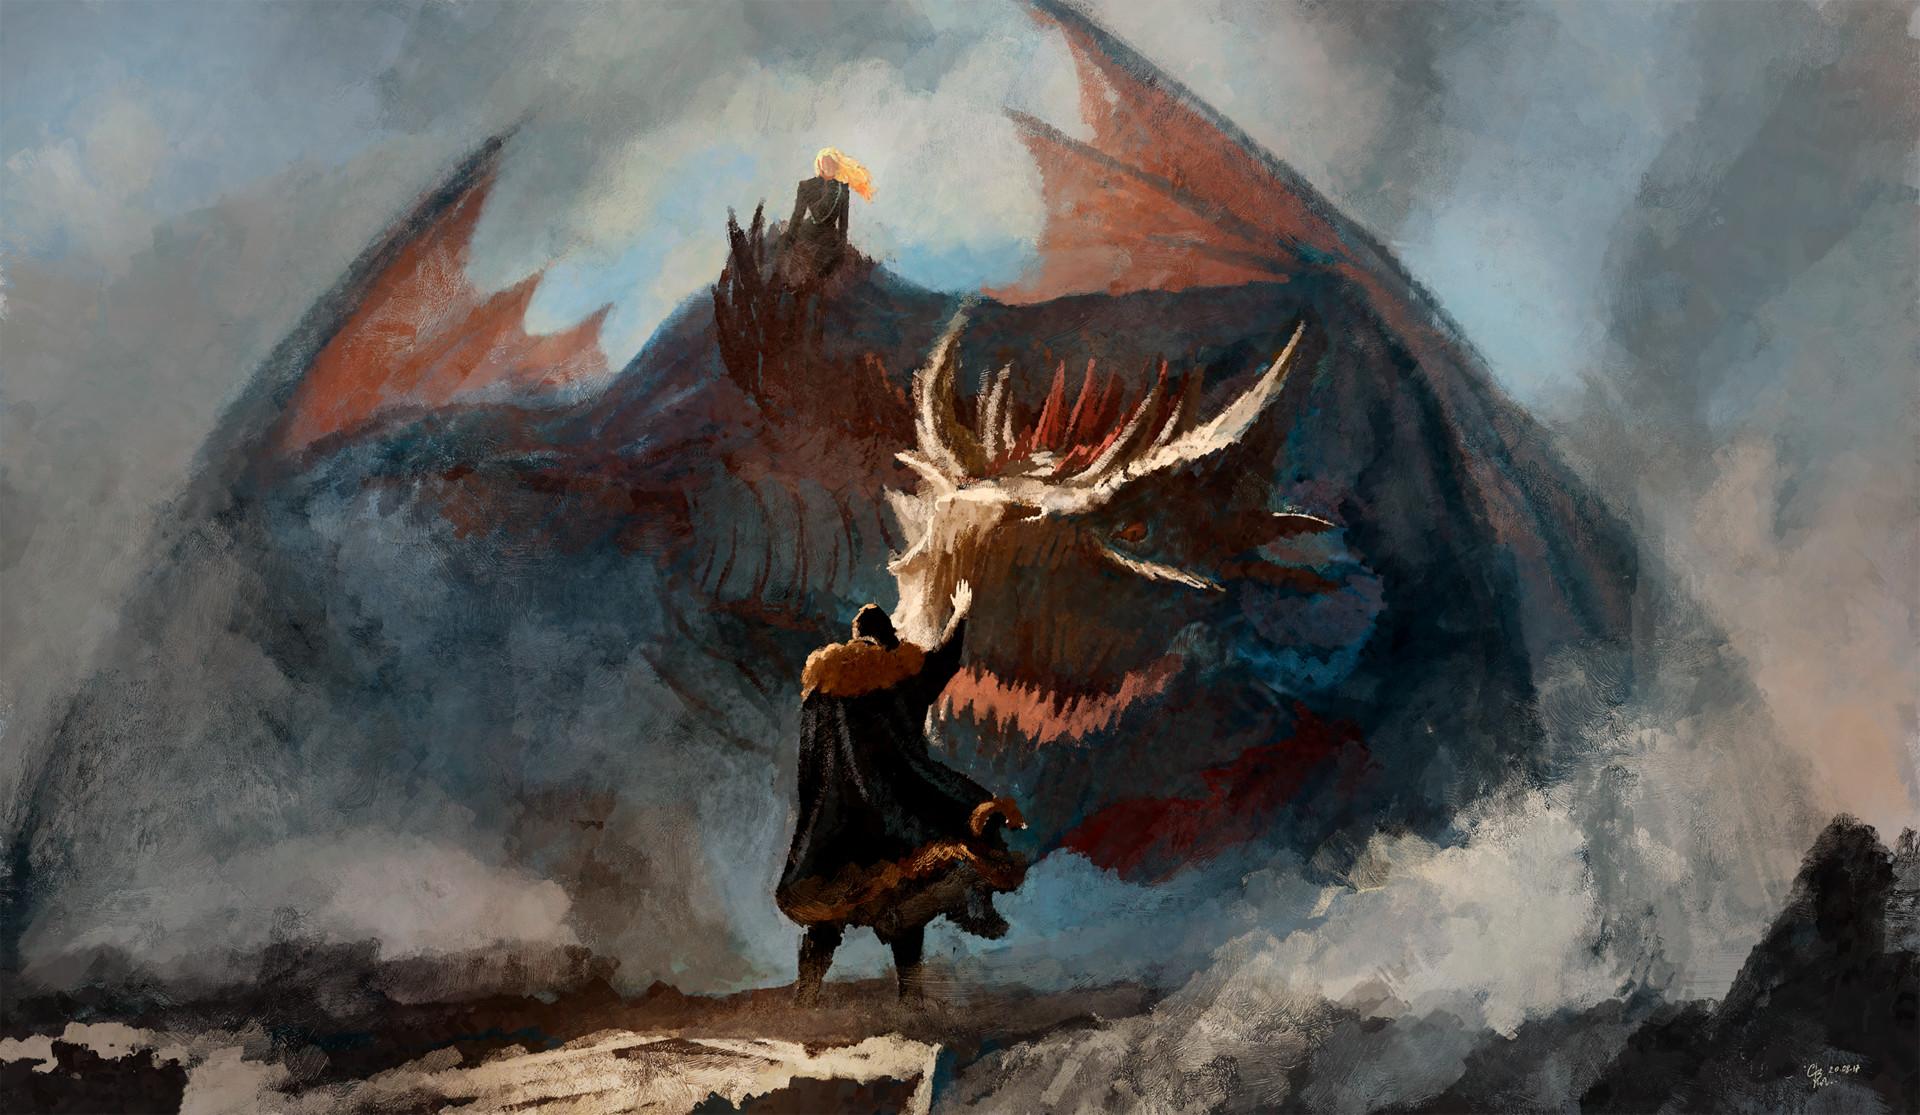 Game of Thrones Jon Snow and Dragon